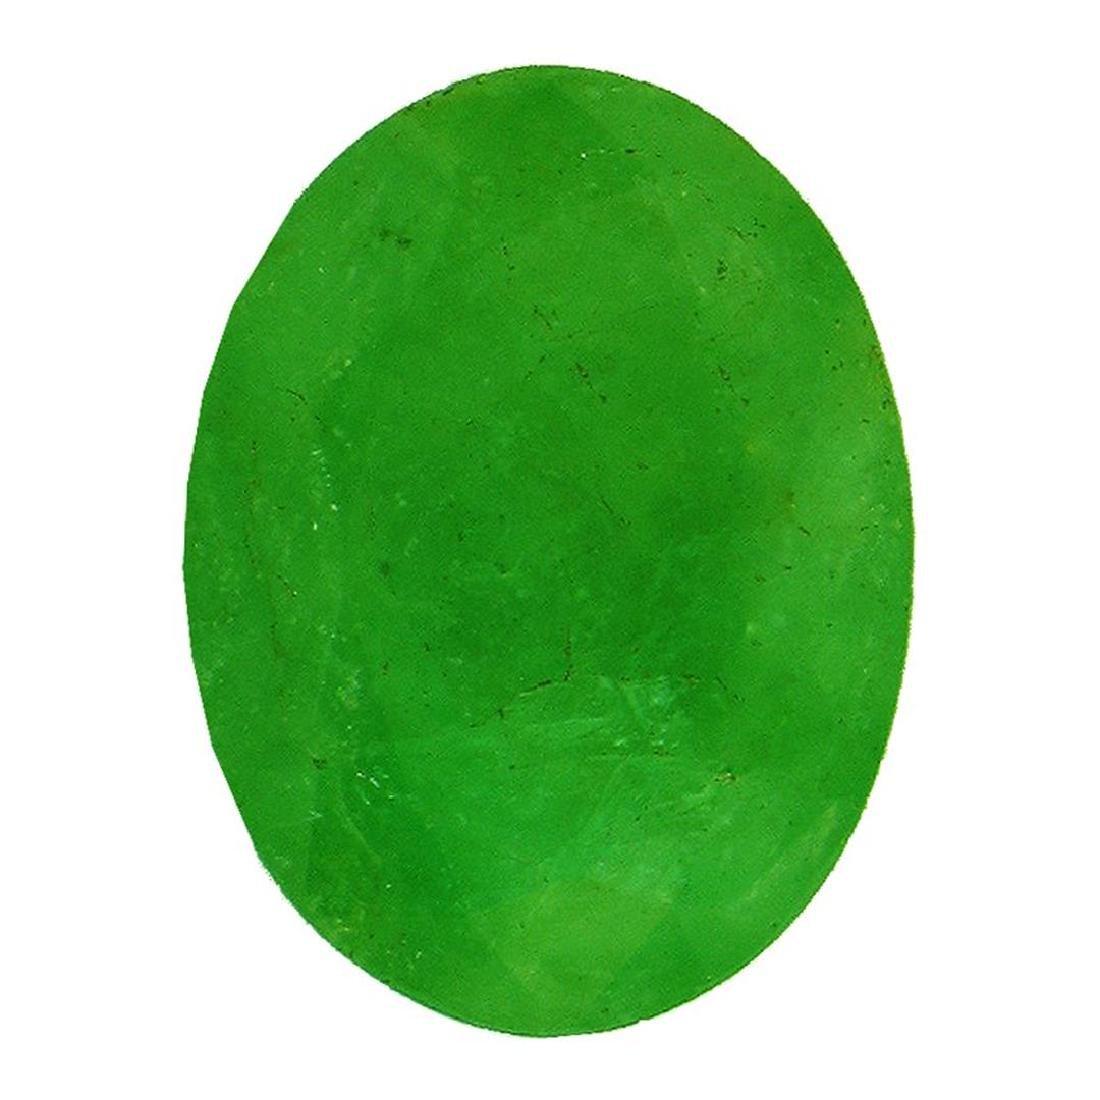 3.05 ctw Oval Emerald Parcel